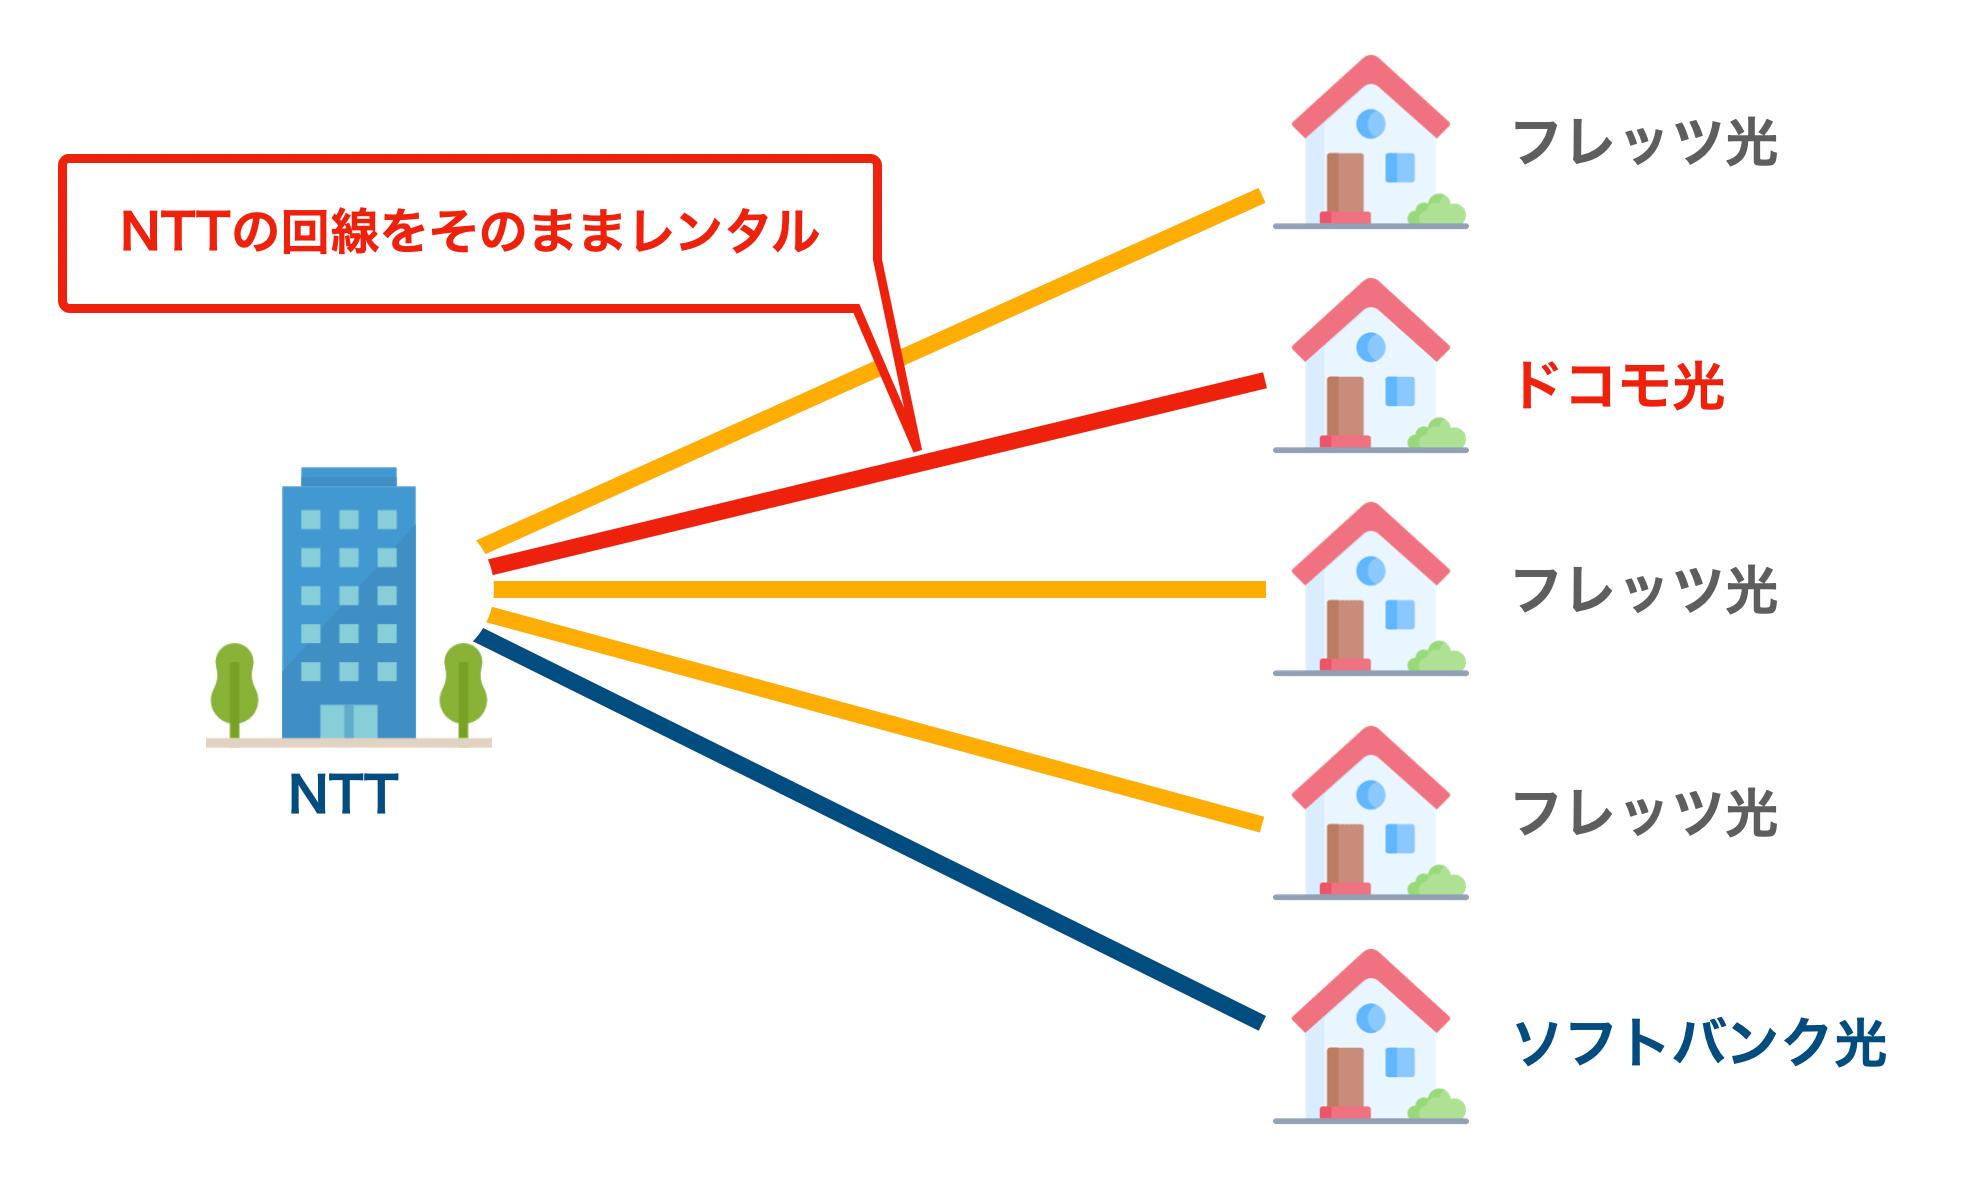 NTT回線のレンタル